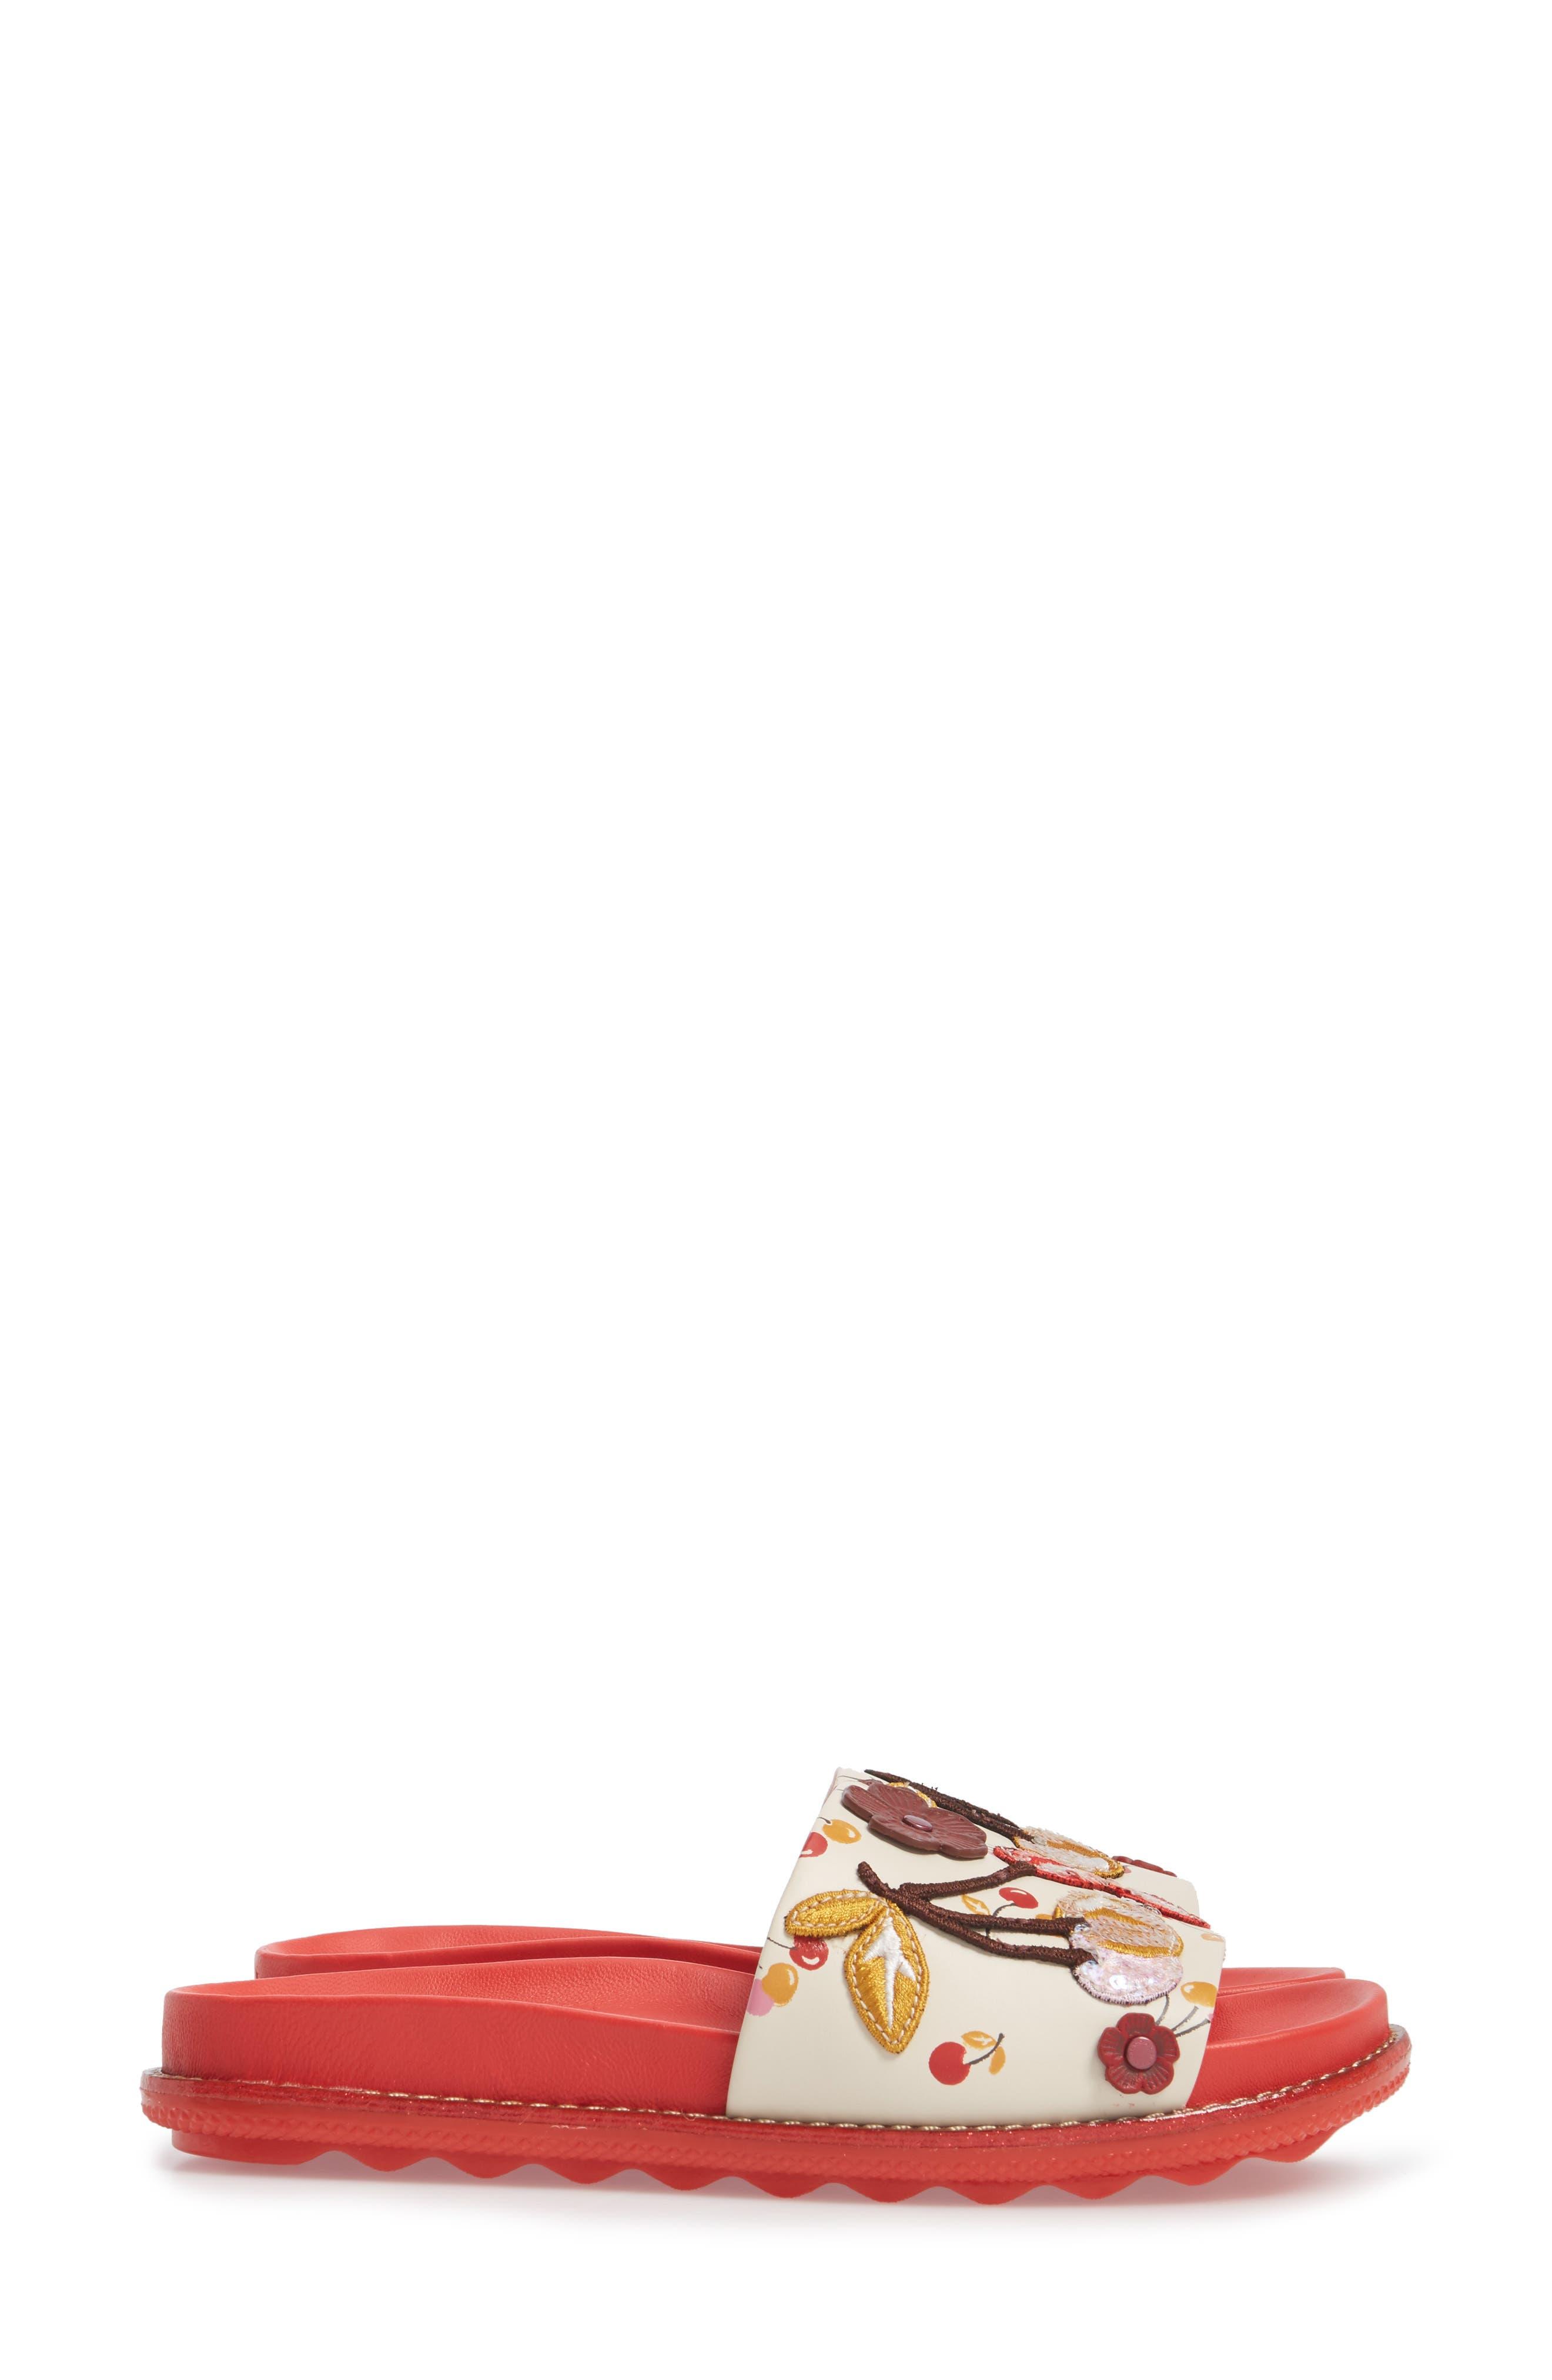 Patch Sport Slide Sandal,                             Alternate thumbnail 3, color,                             Ivory/ Red Leather